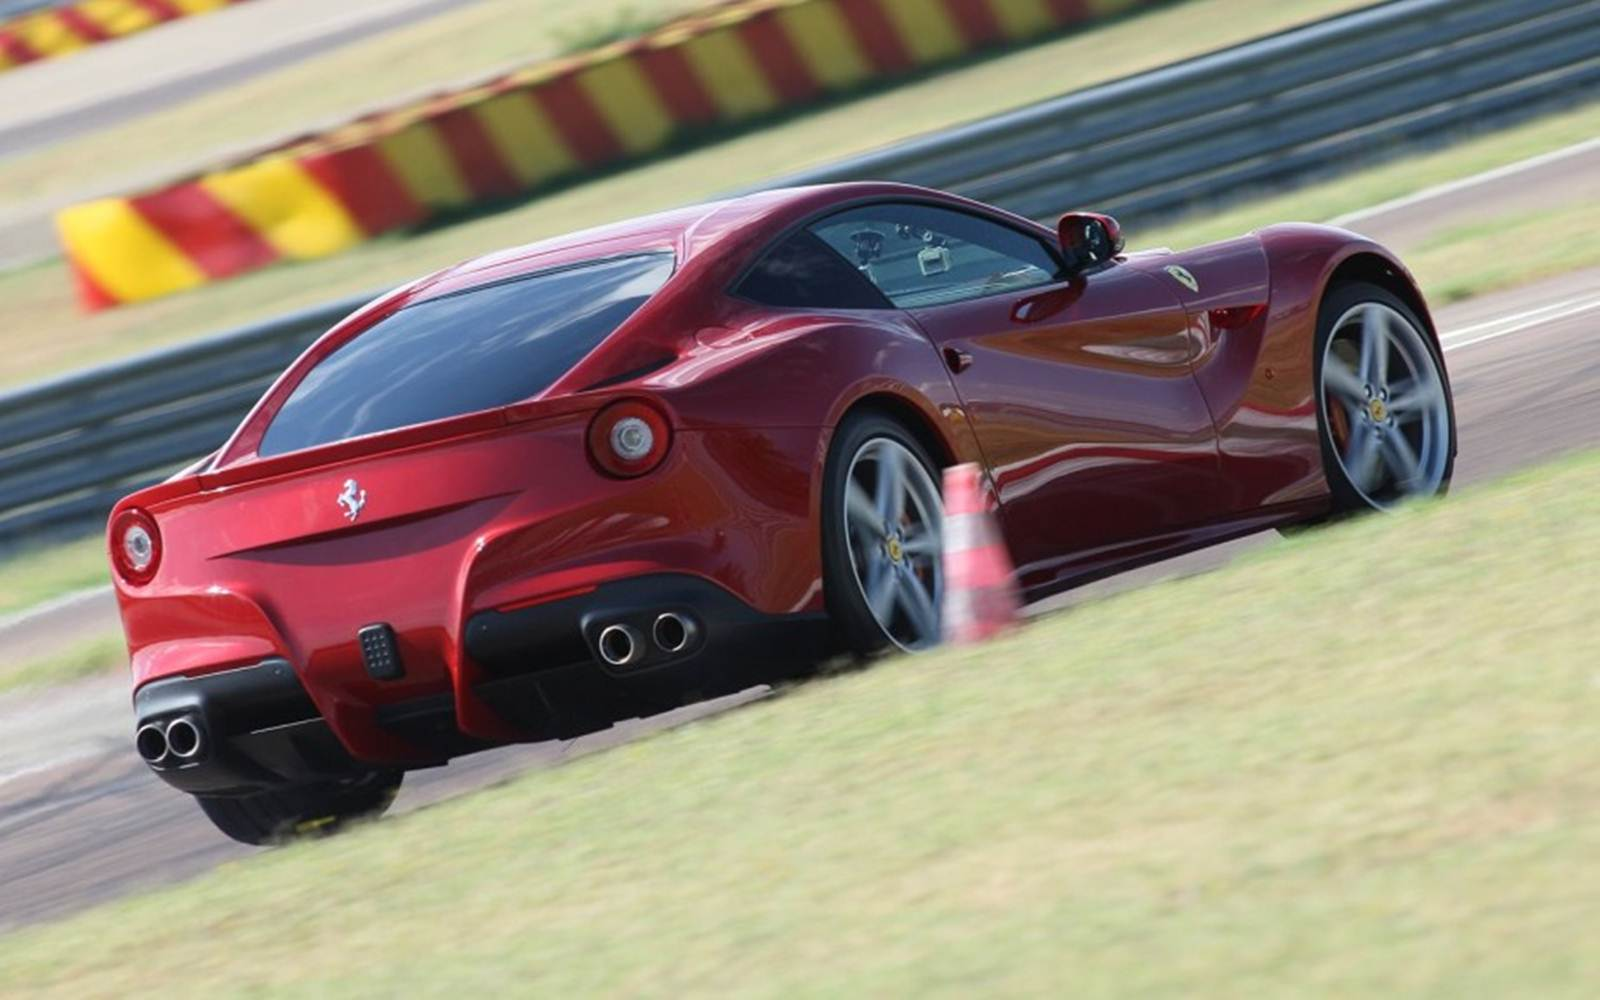 http://4.bp.blogspot.com/-jg7nqyjY90A/UEAcf_LJVFI/AAAAAAAAcm8/NW-tgSkkKj4/s1600/Ferrari-F12-Berlinetta-lateral+(3).jpg